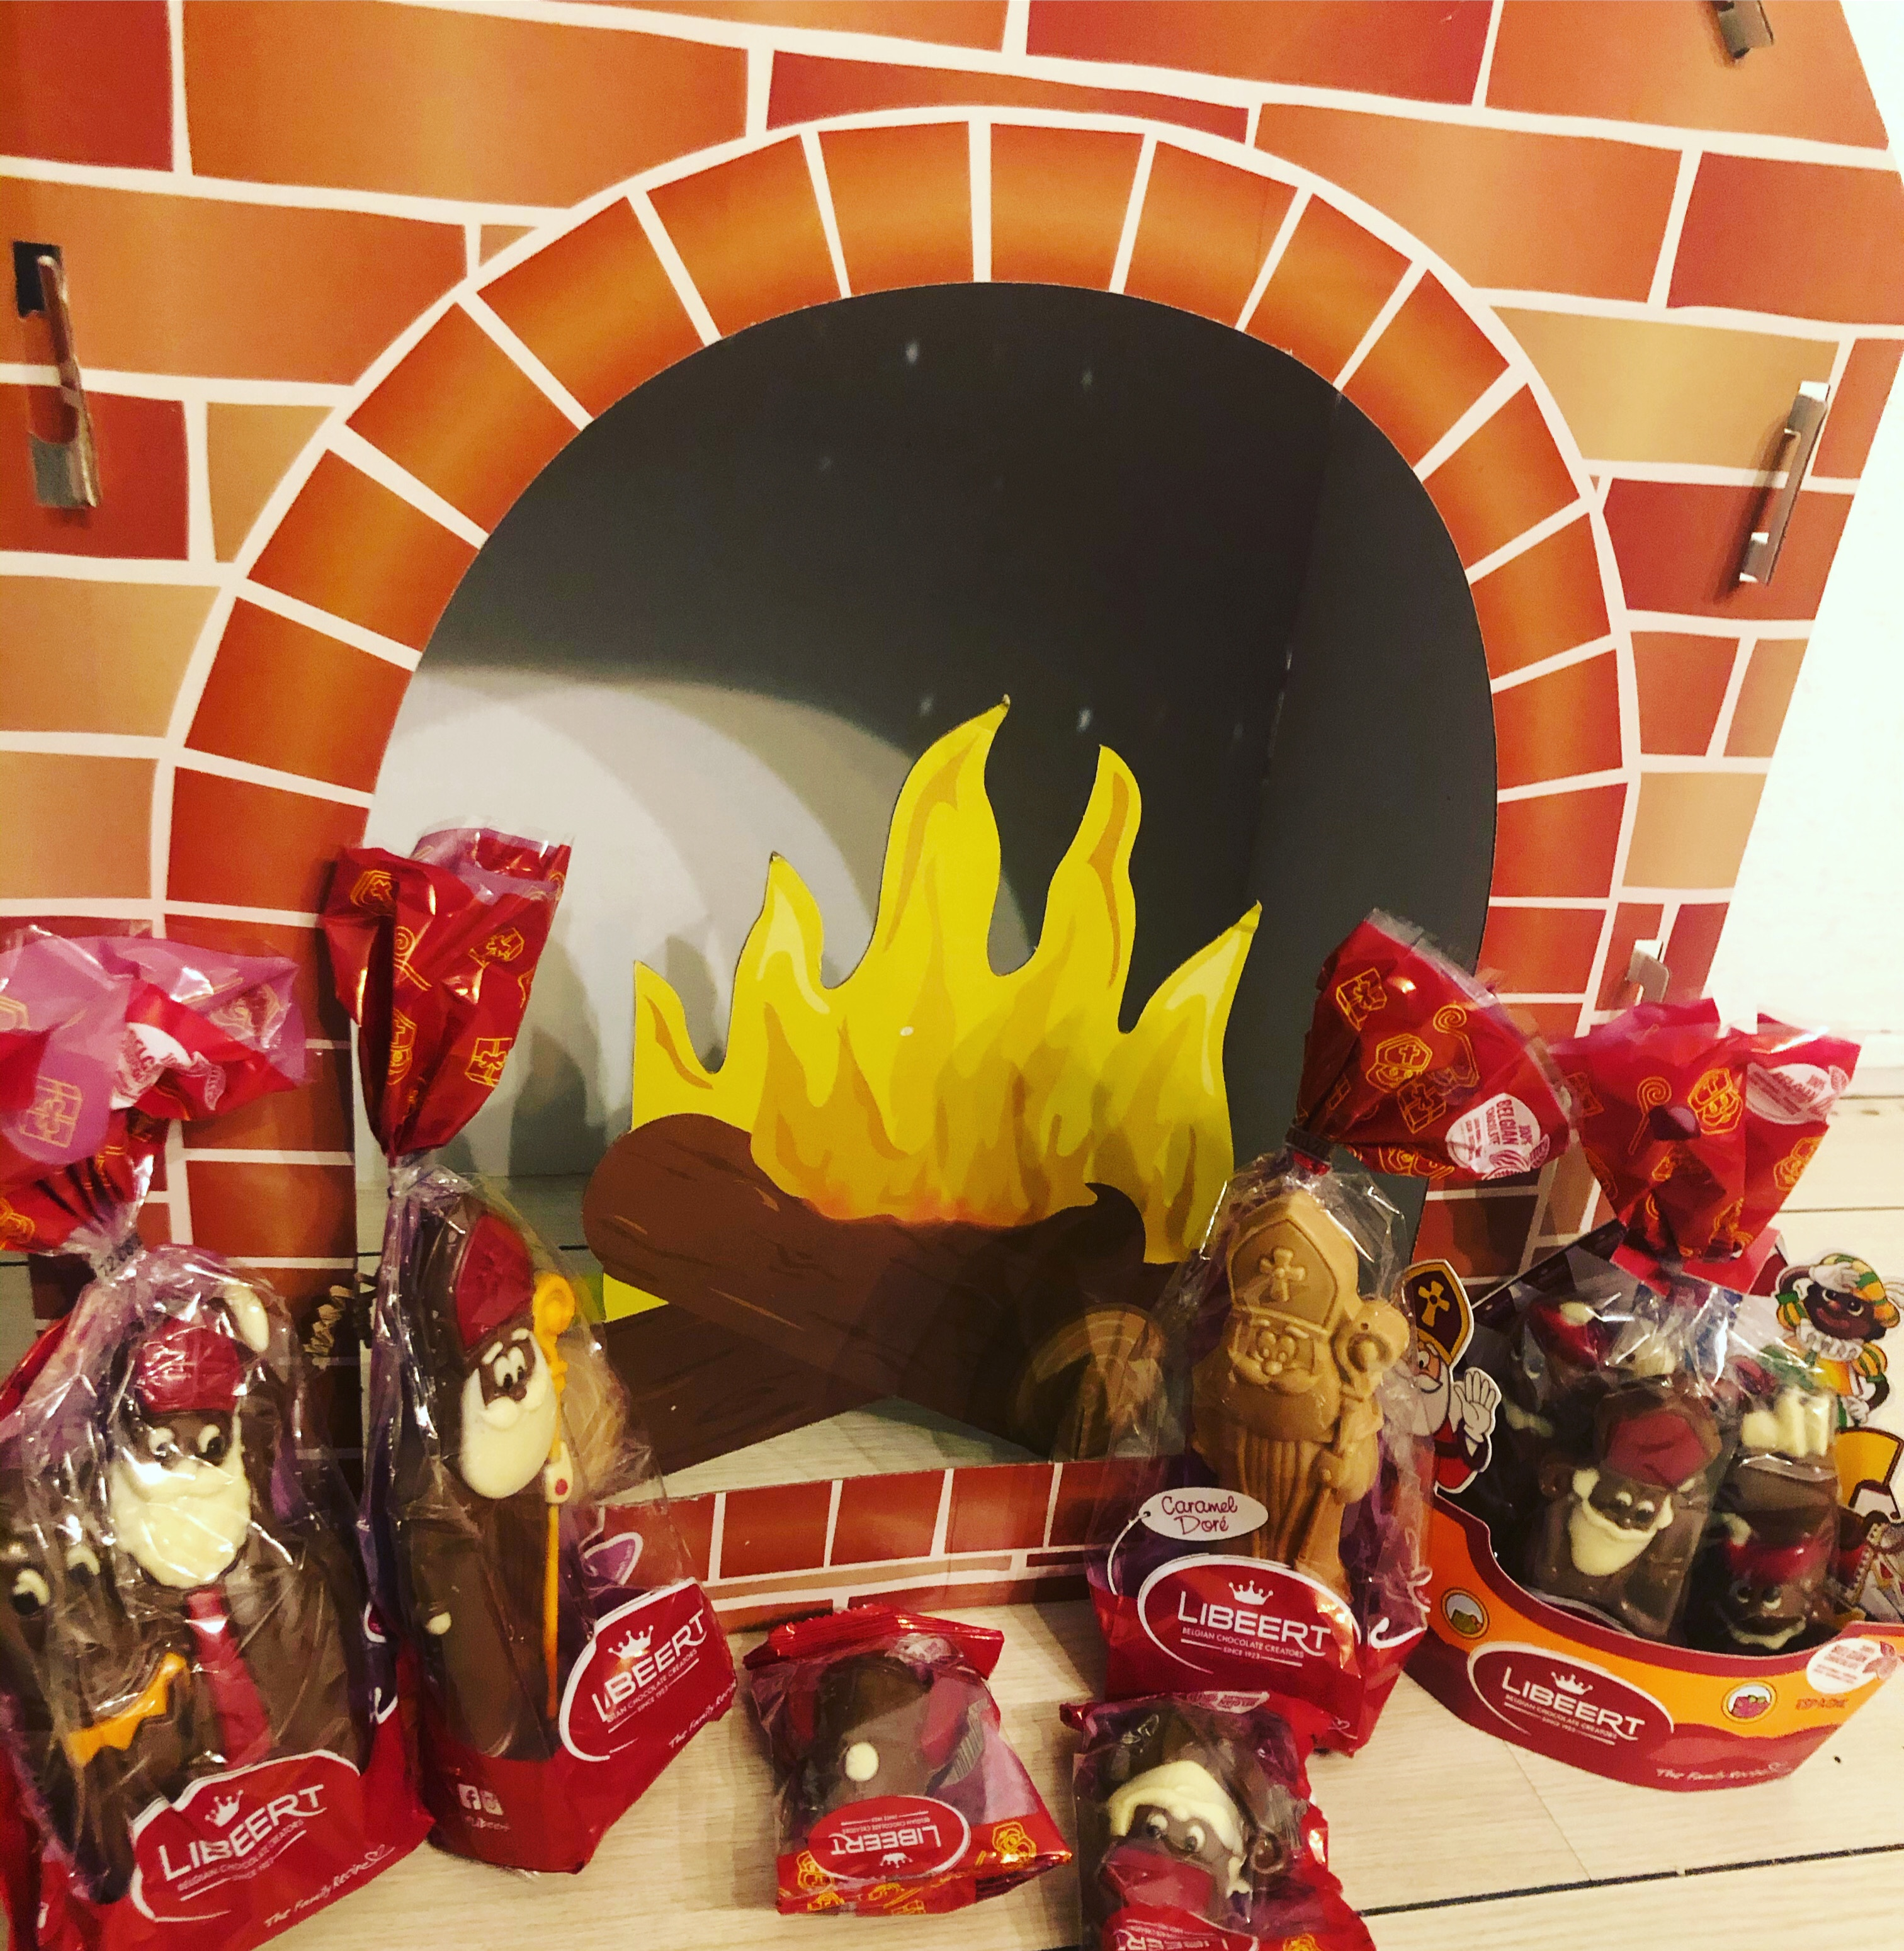 libeert chocolade, sinterklaas, sint, cadeau, chocolade